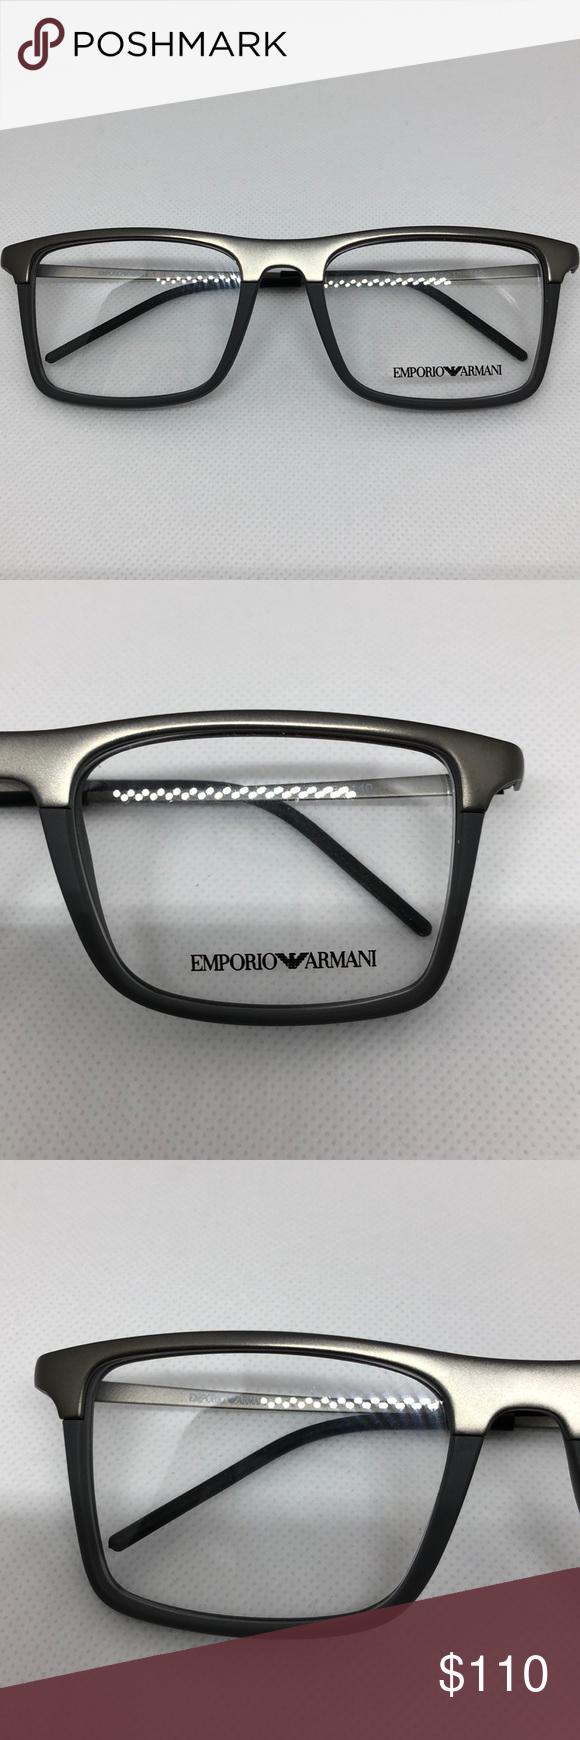 0cc87000e5a9 Emporio Armani Frames with Case Emporio Armani Frames for men with Case  Emporio Armani Accessories Glasses